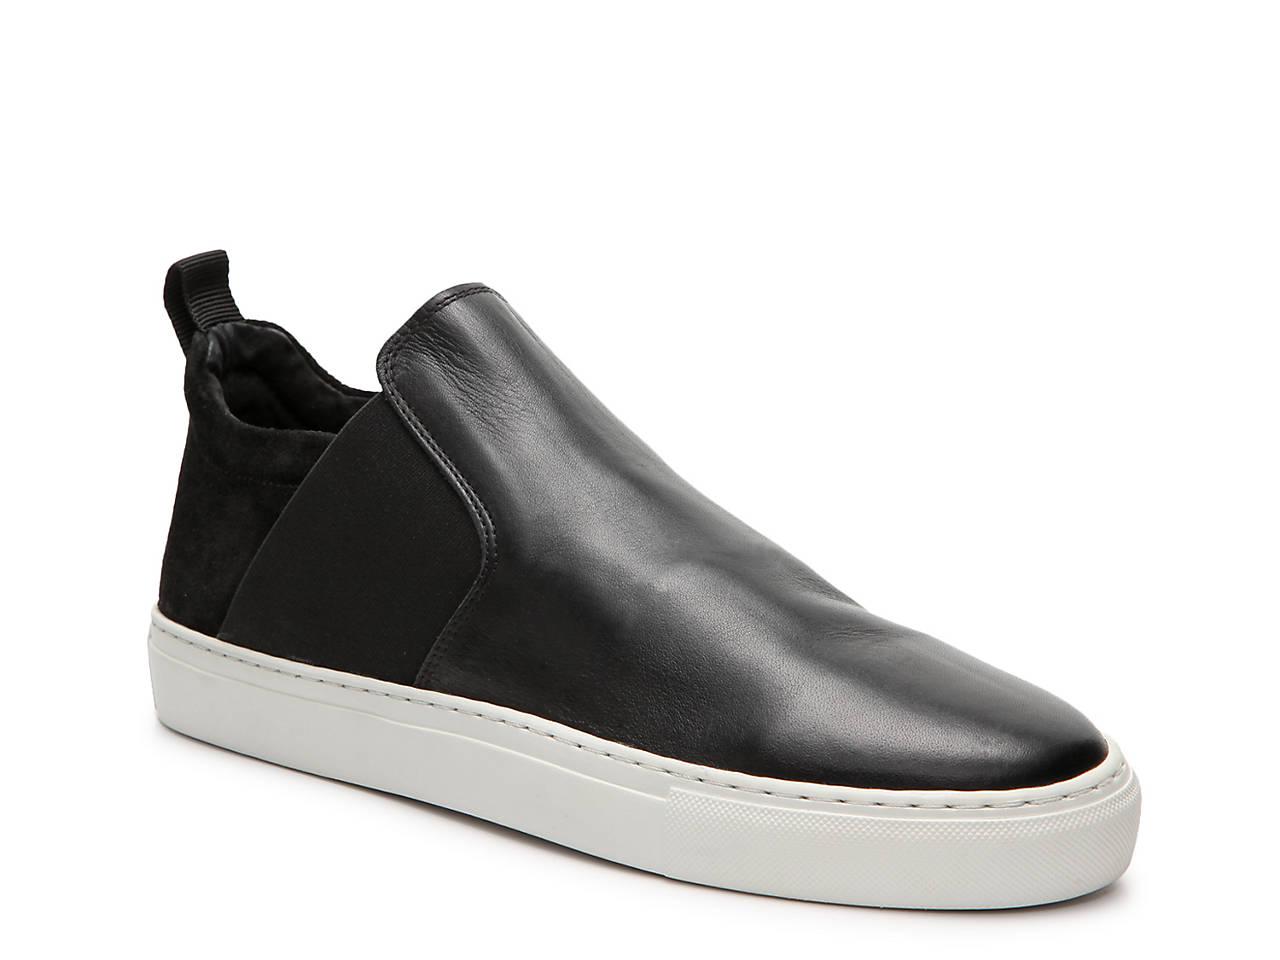 a534ab246fbf7 Supply Lab Landon Slip-On Sneaker Men s Shoes